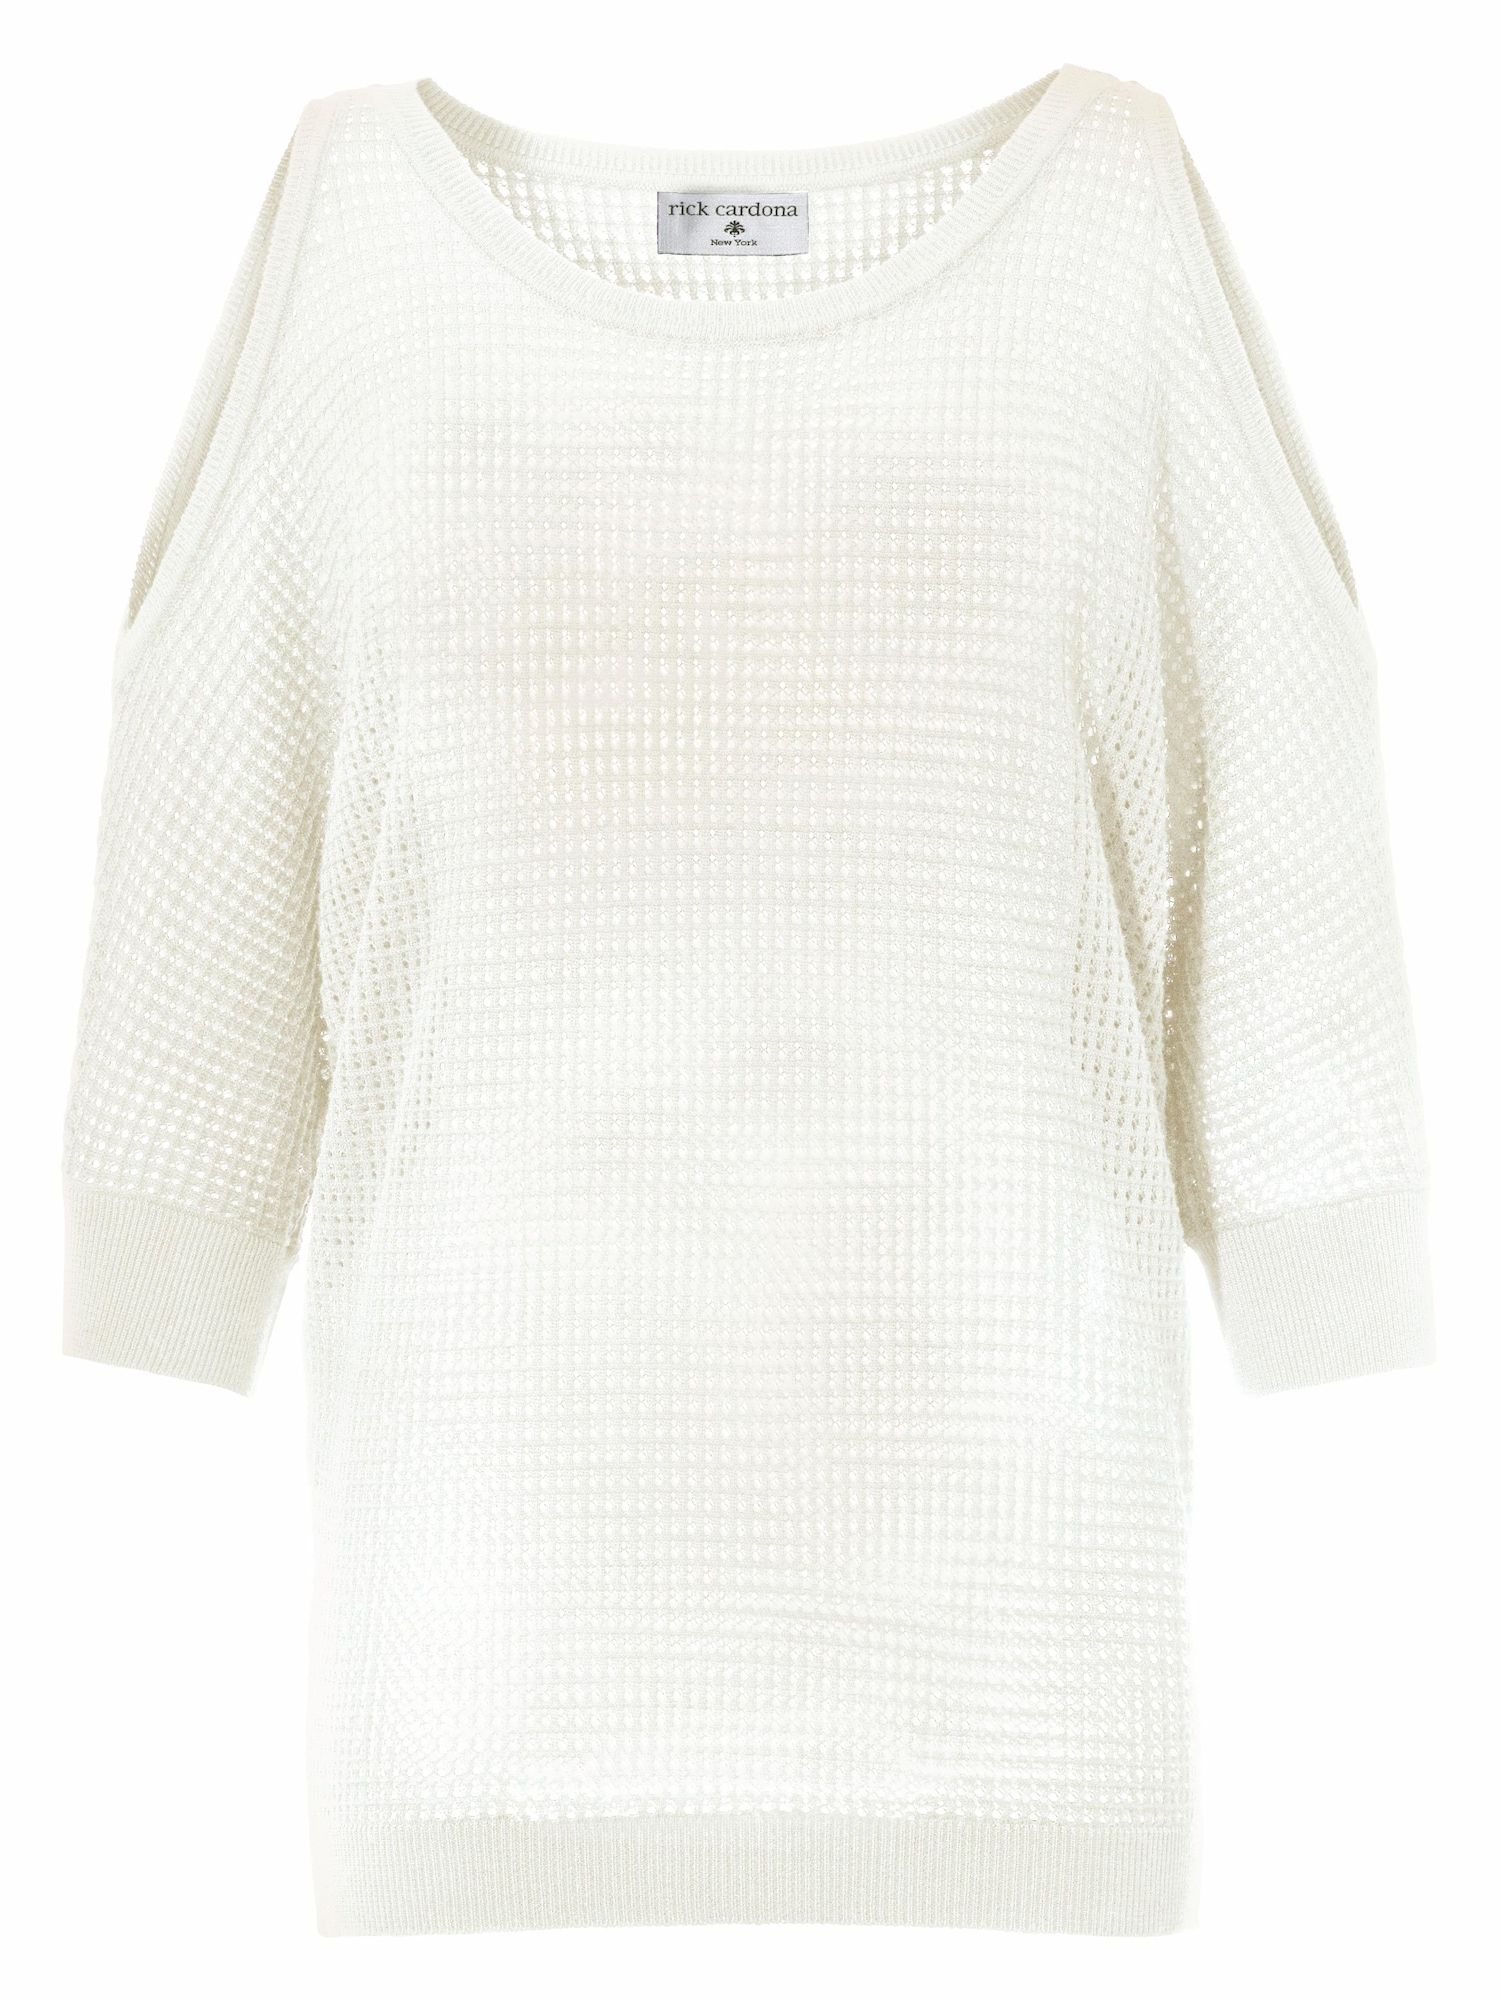 Longpullover mit Cut-Outs an den Schultern | Bekleidung > Pullover > Longpullover | heine